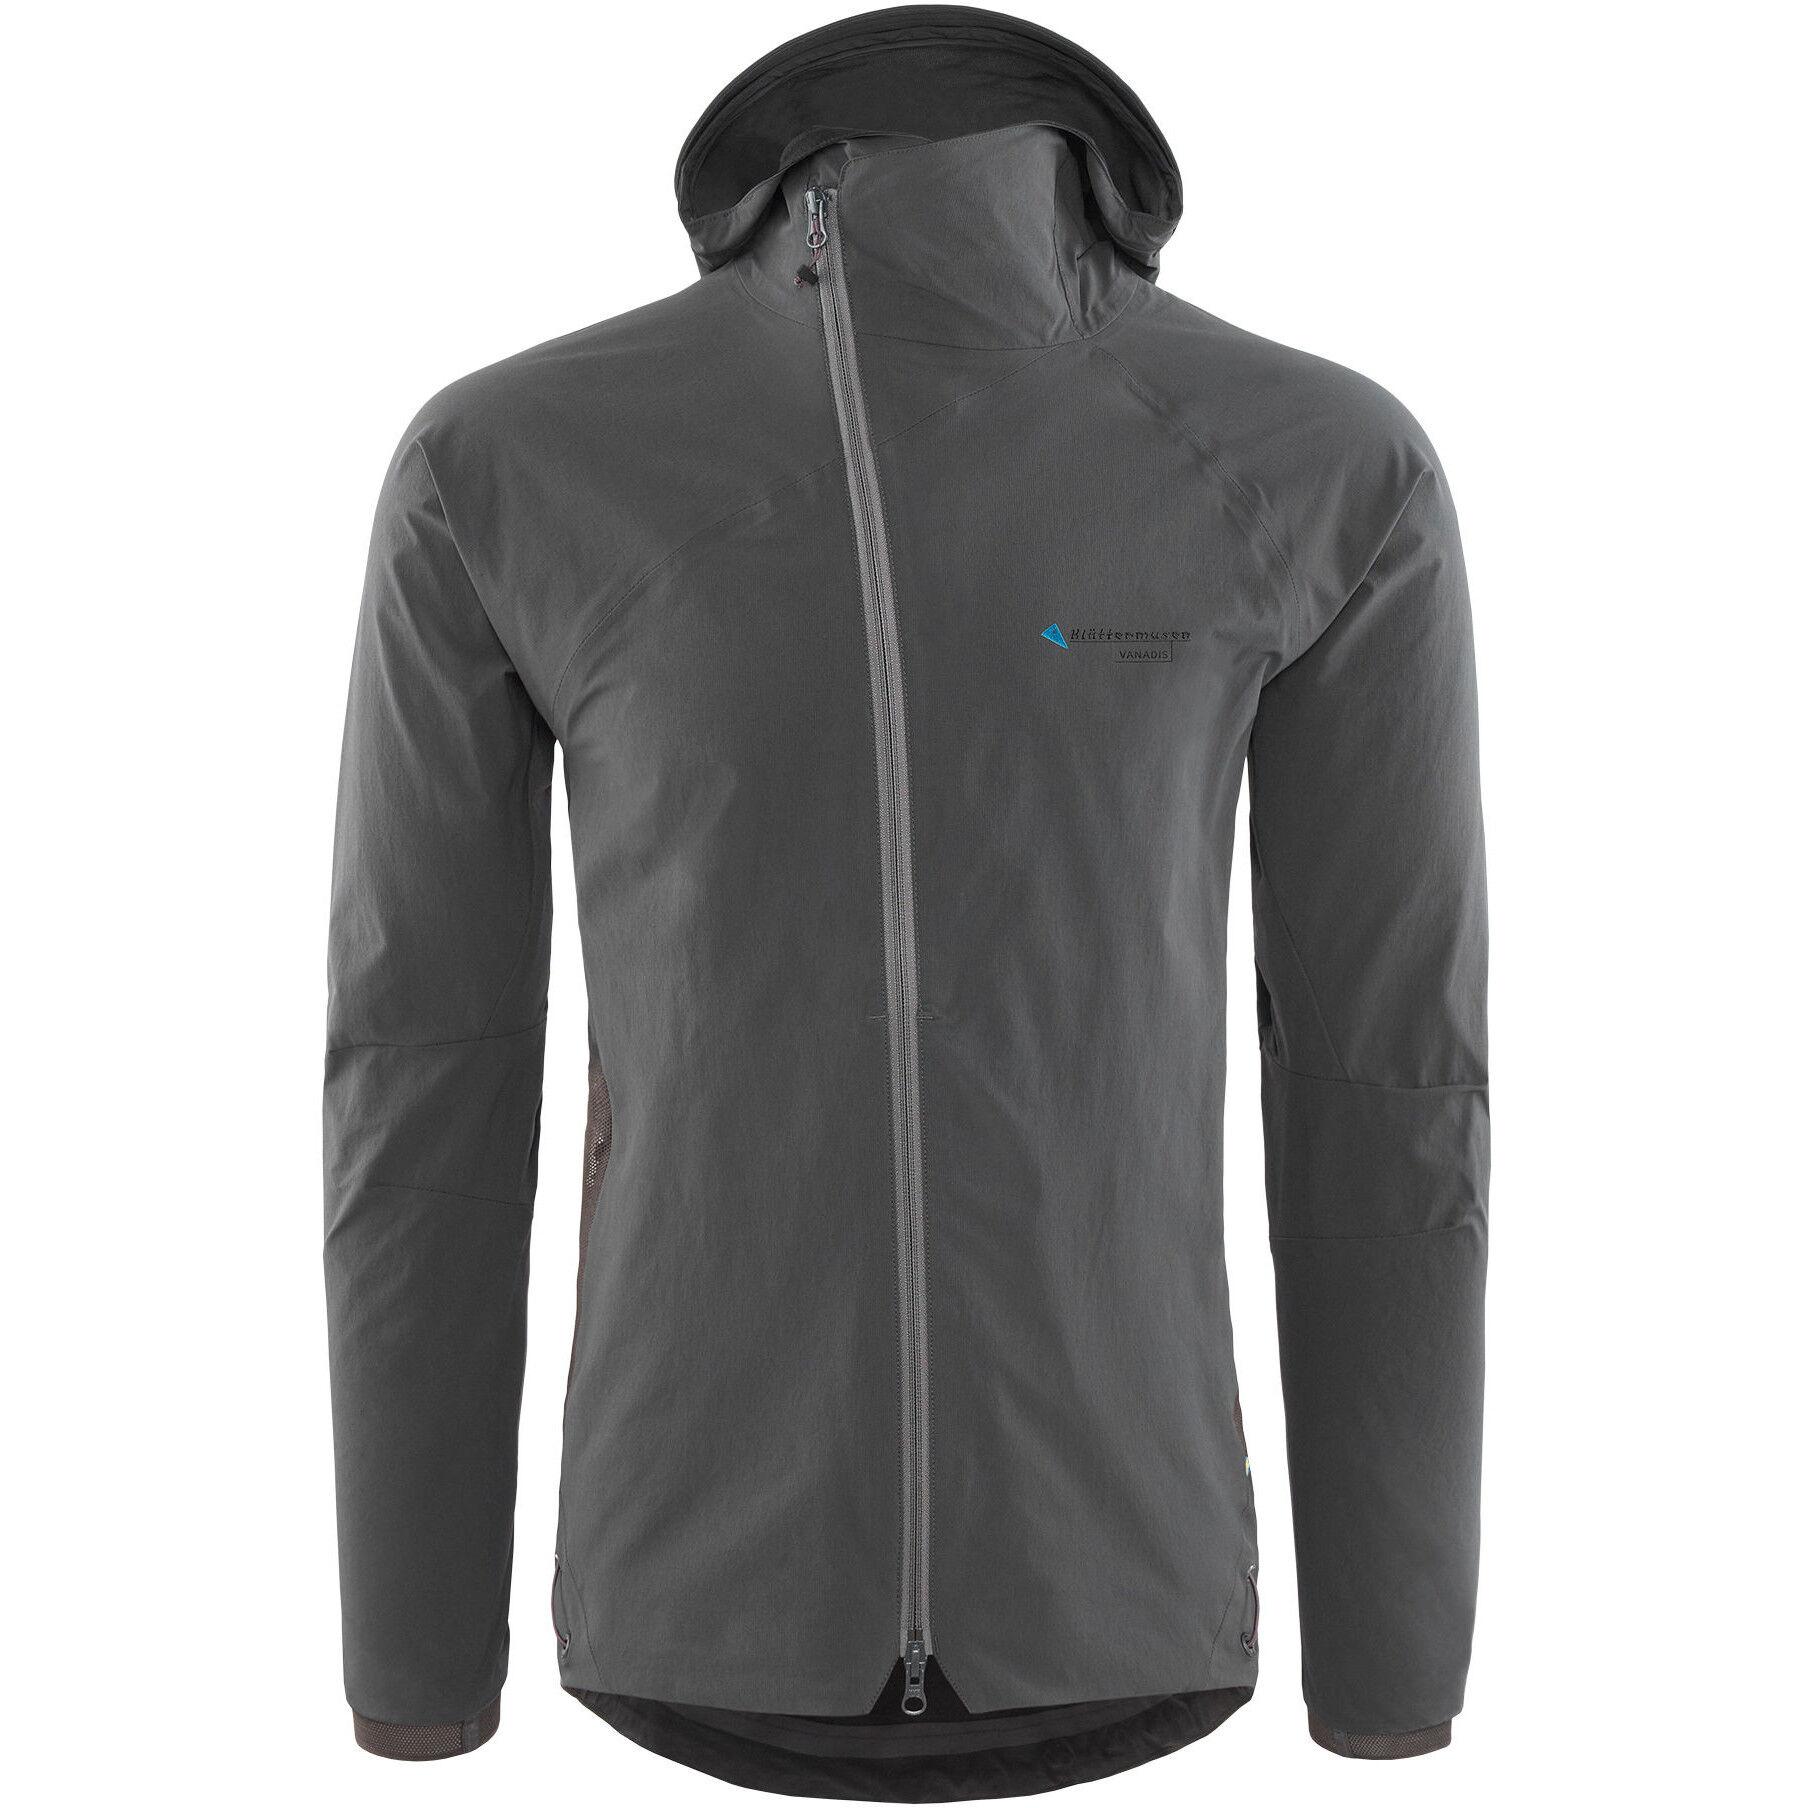 Klattermusen Mens Njorun Fleece Jacket (Rock Grey